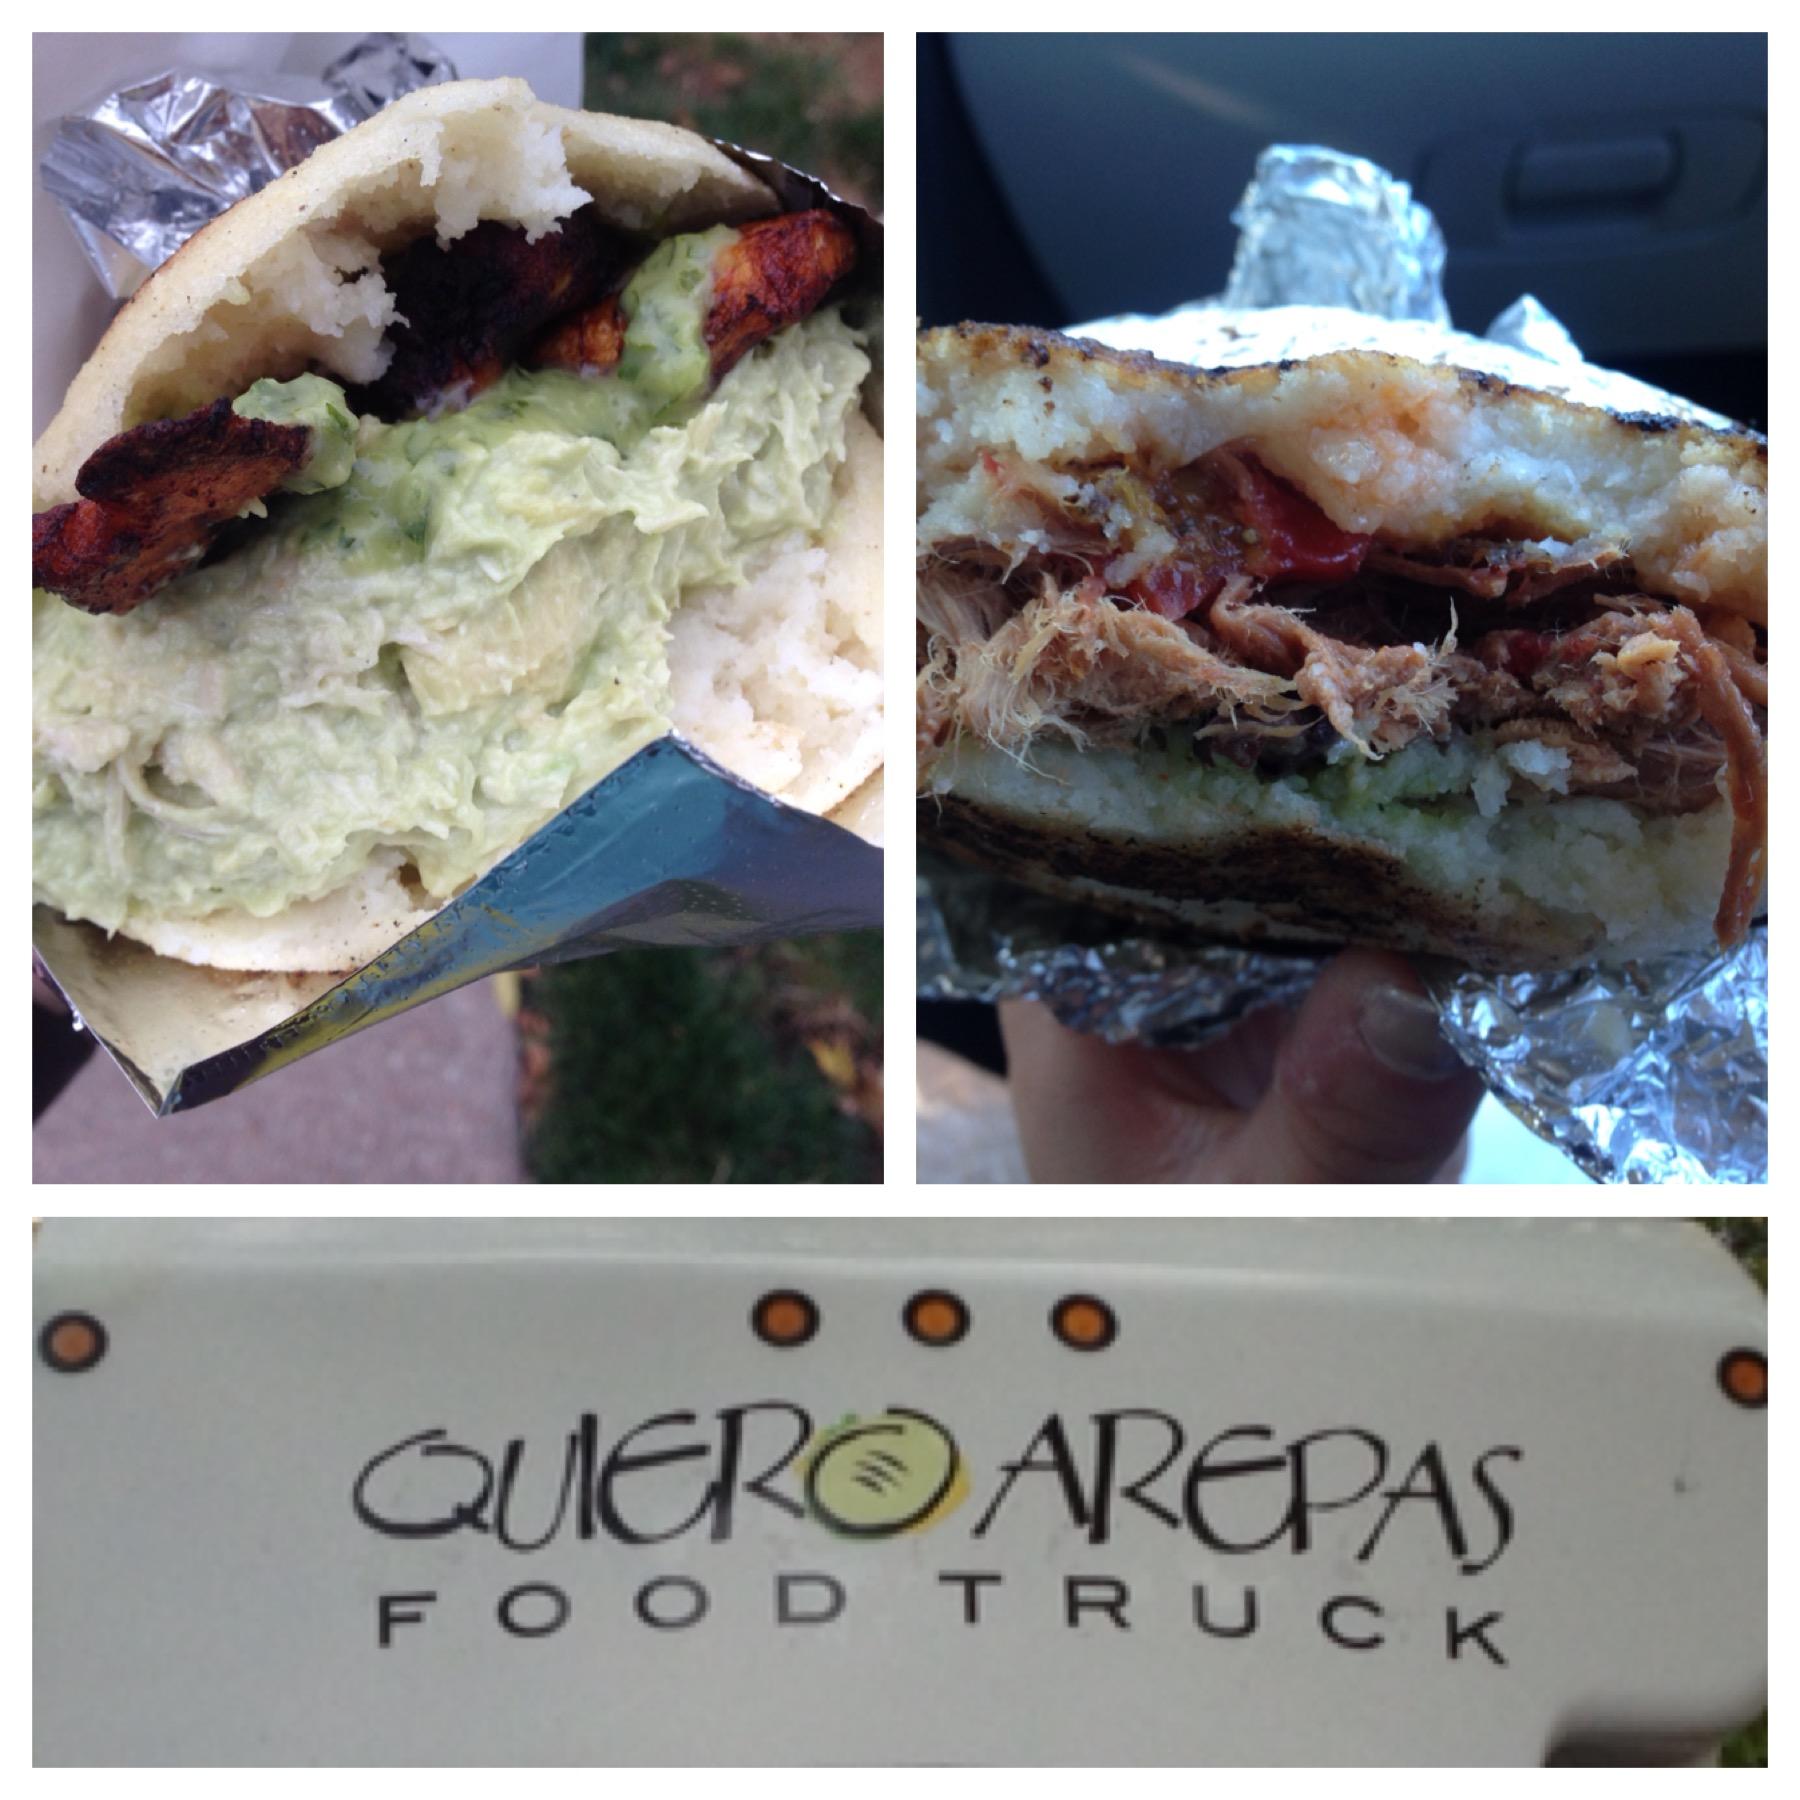 Lunch from Quiero Arepas